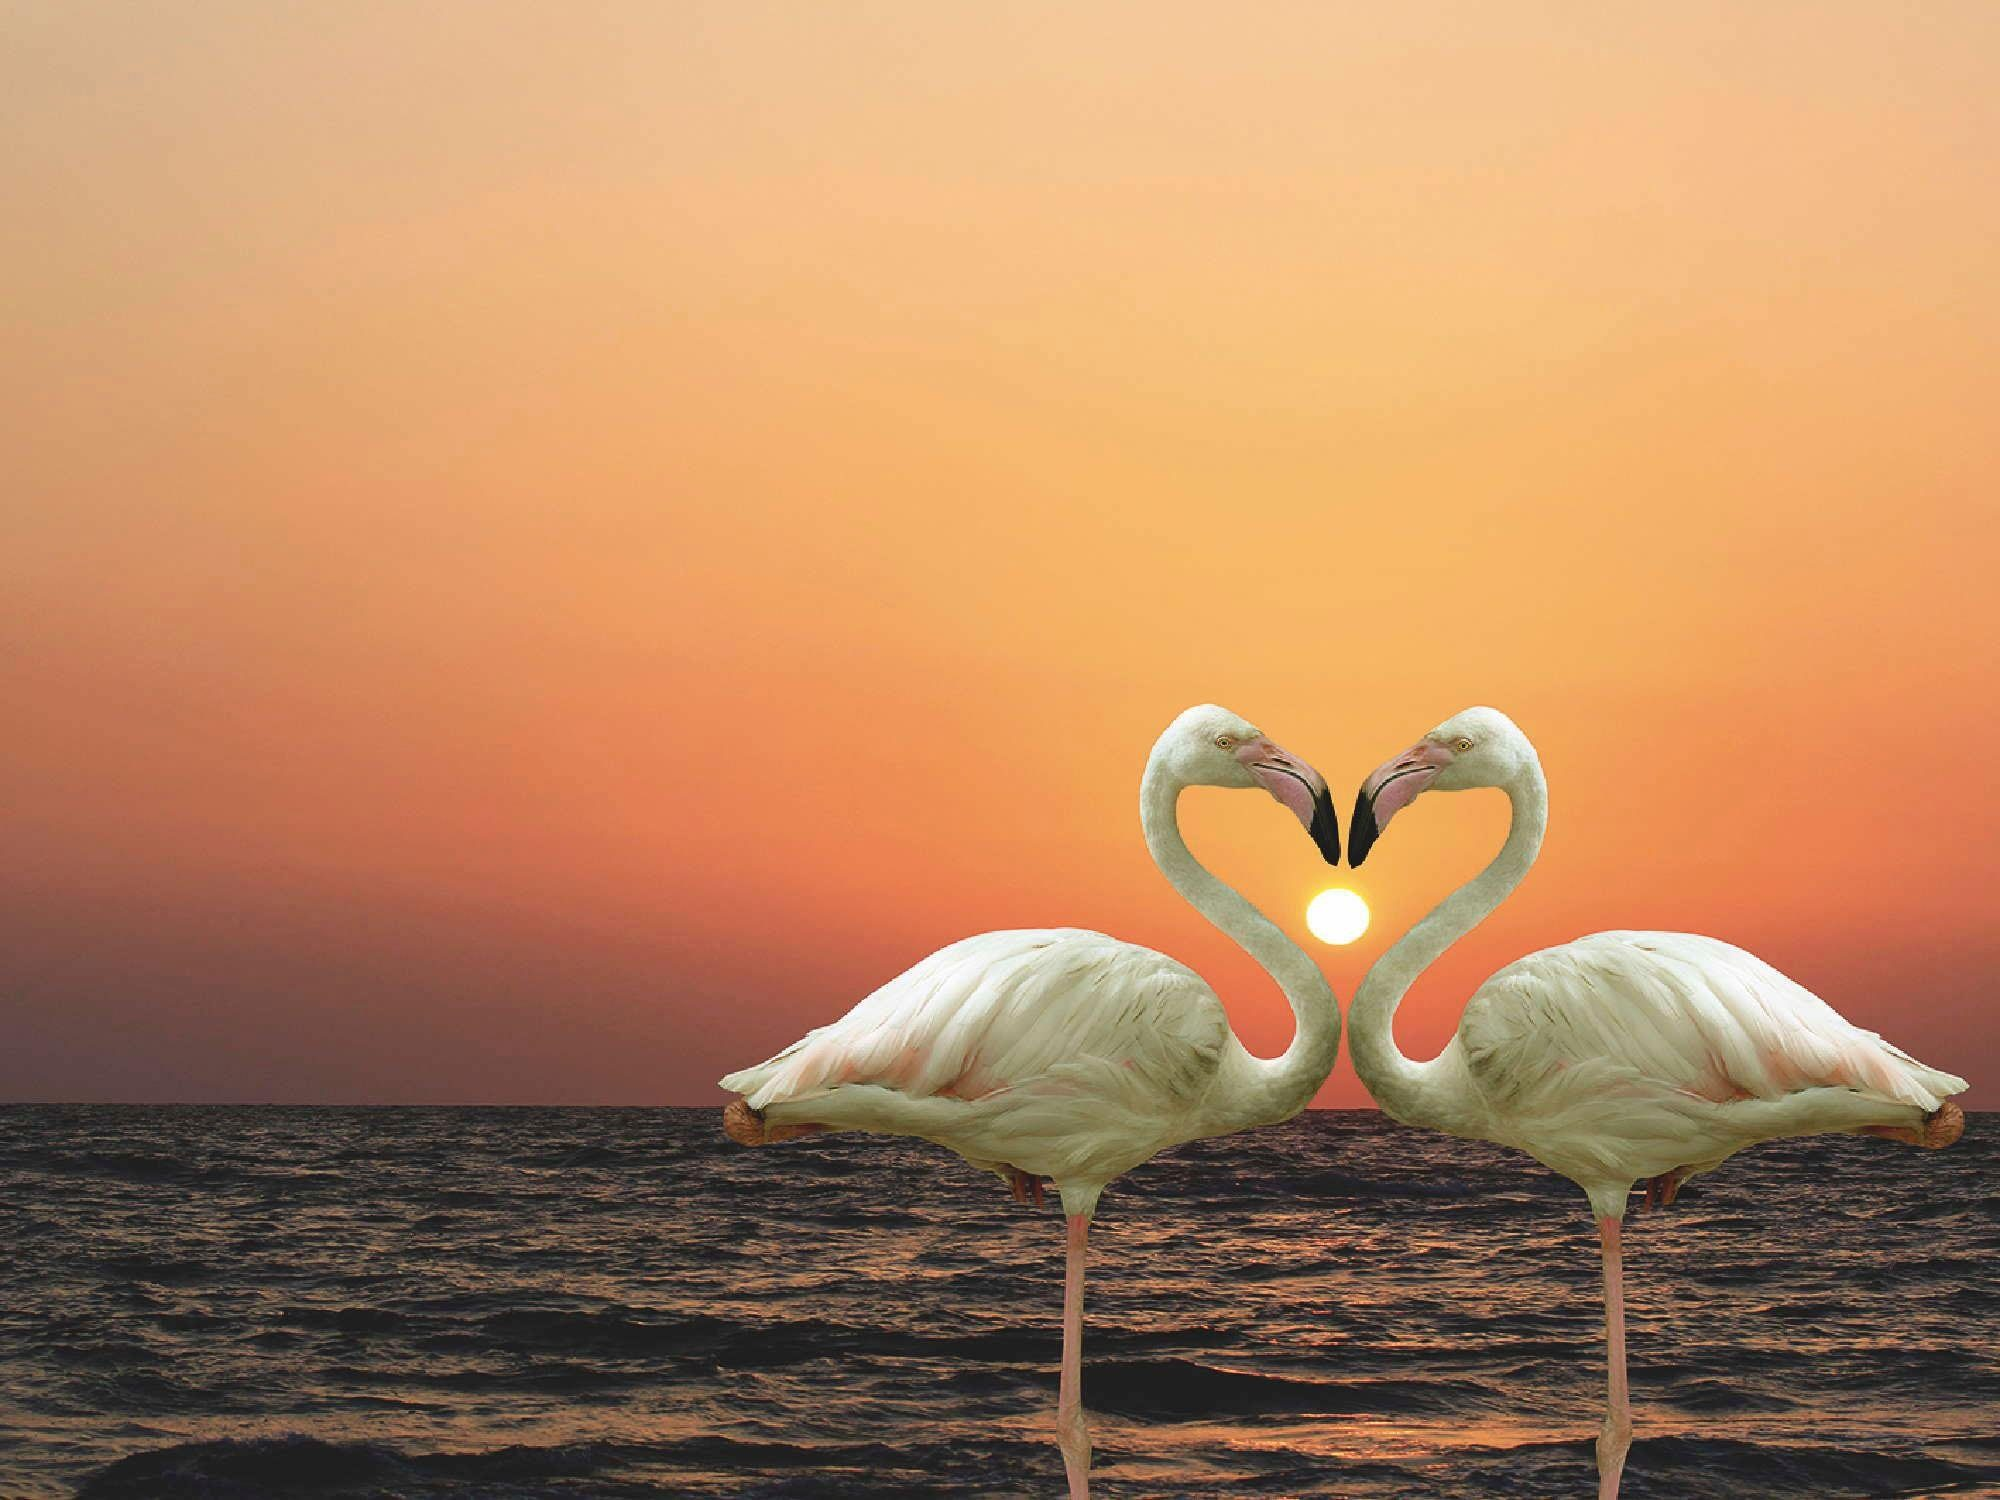 Home affaire Leinwandbild »Flamingo-Paar - am Abend am Strand«, 80/60 cm